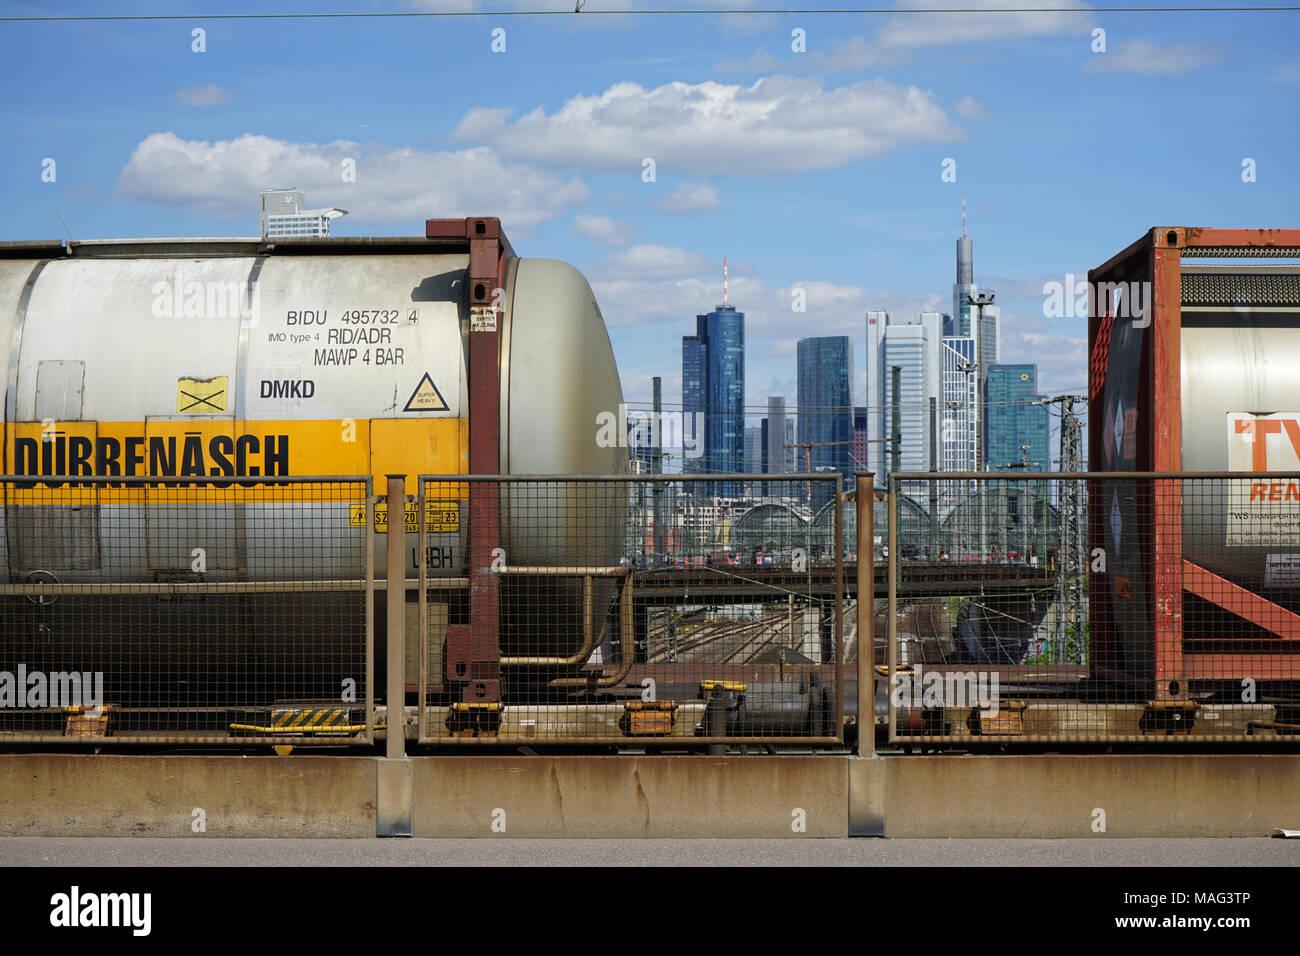 Two Waggons of a Freight Train, Skyline, Frankfurt, Germany, - Stock Image